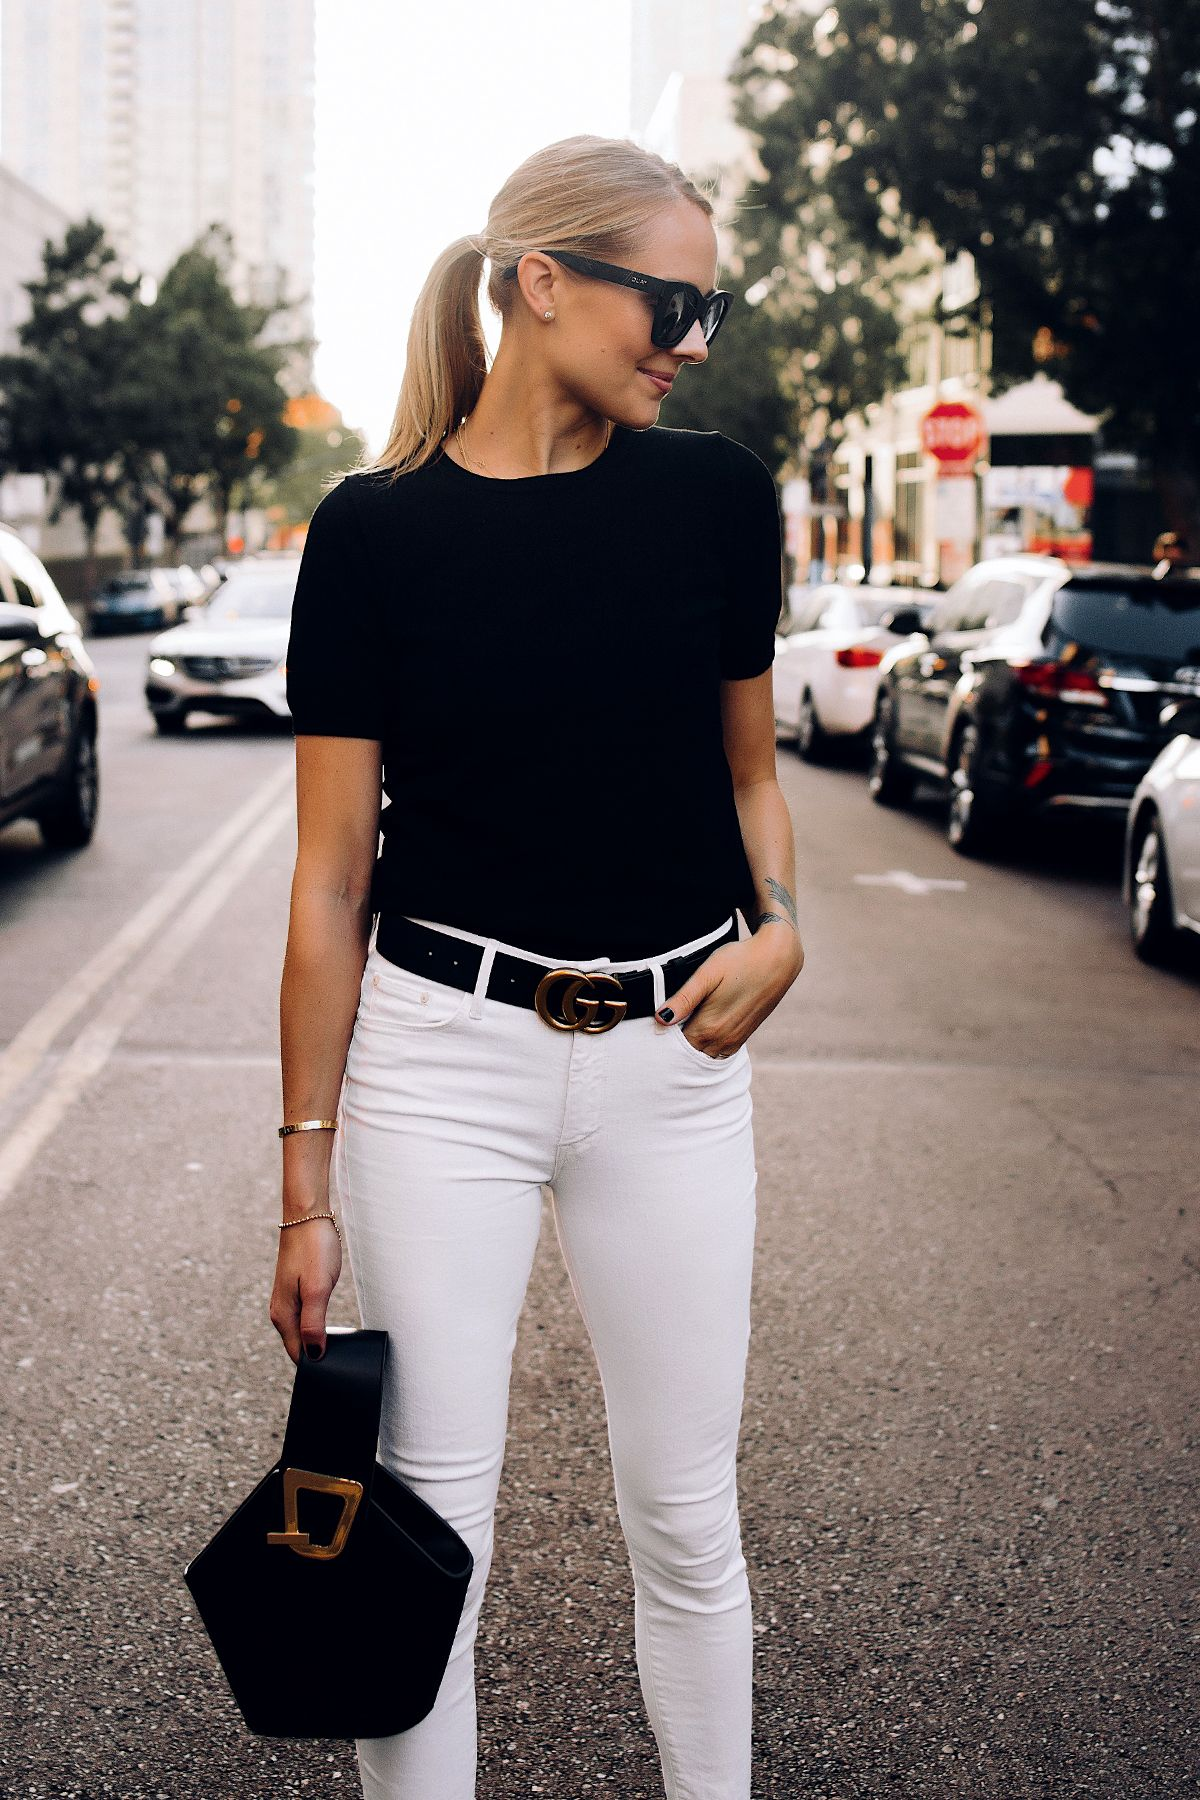 752a2b59ac1 ... Ann Taylor Black Short Sleeve Sweater White Jeans Black Gucci Belt  Black Danse Lente Bucket Bag Fashion Jackson San Diego Fashion Blogger  Street Style